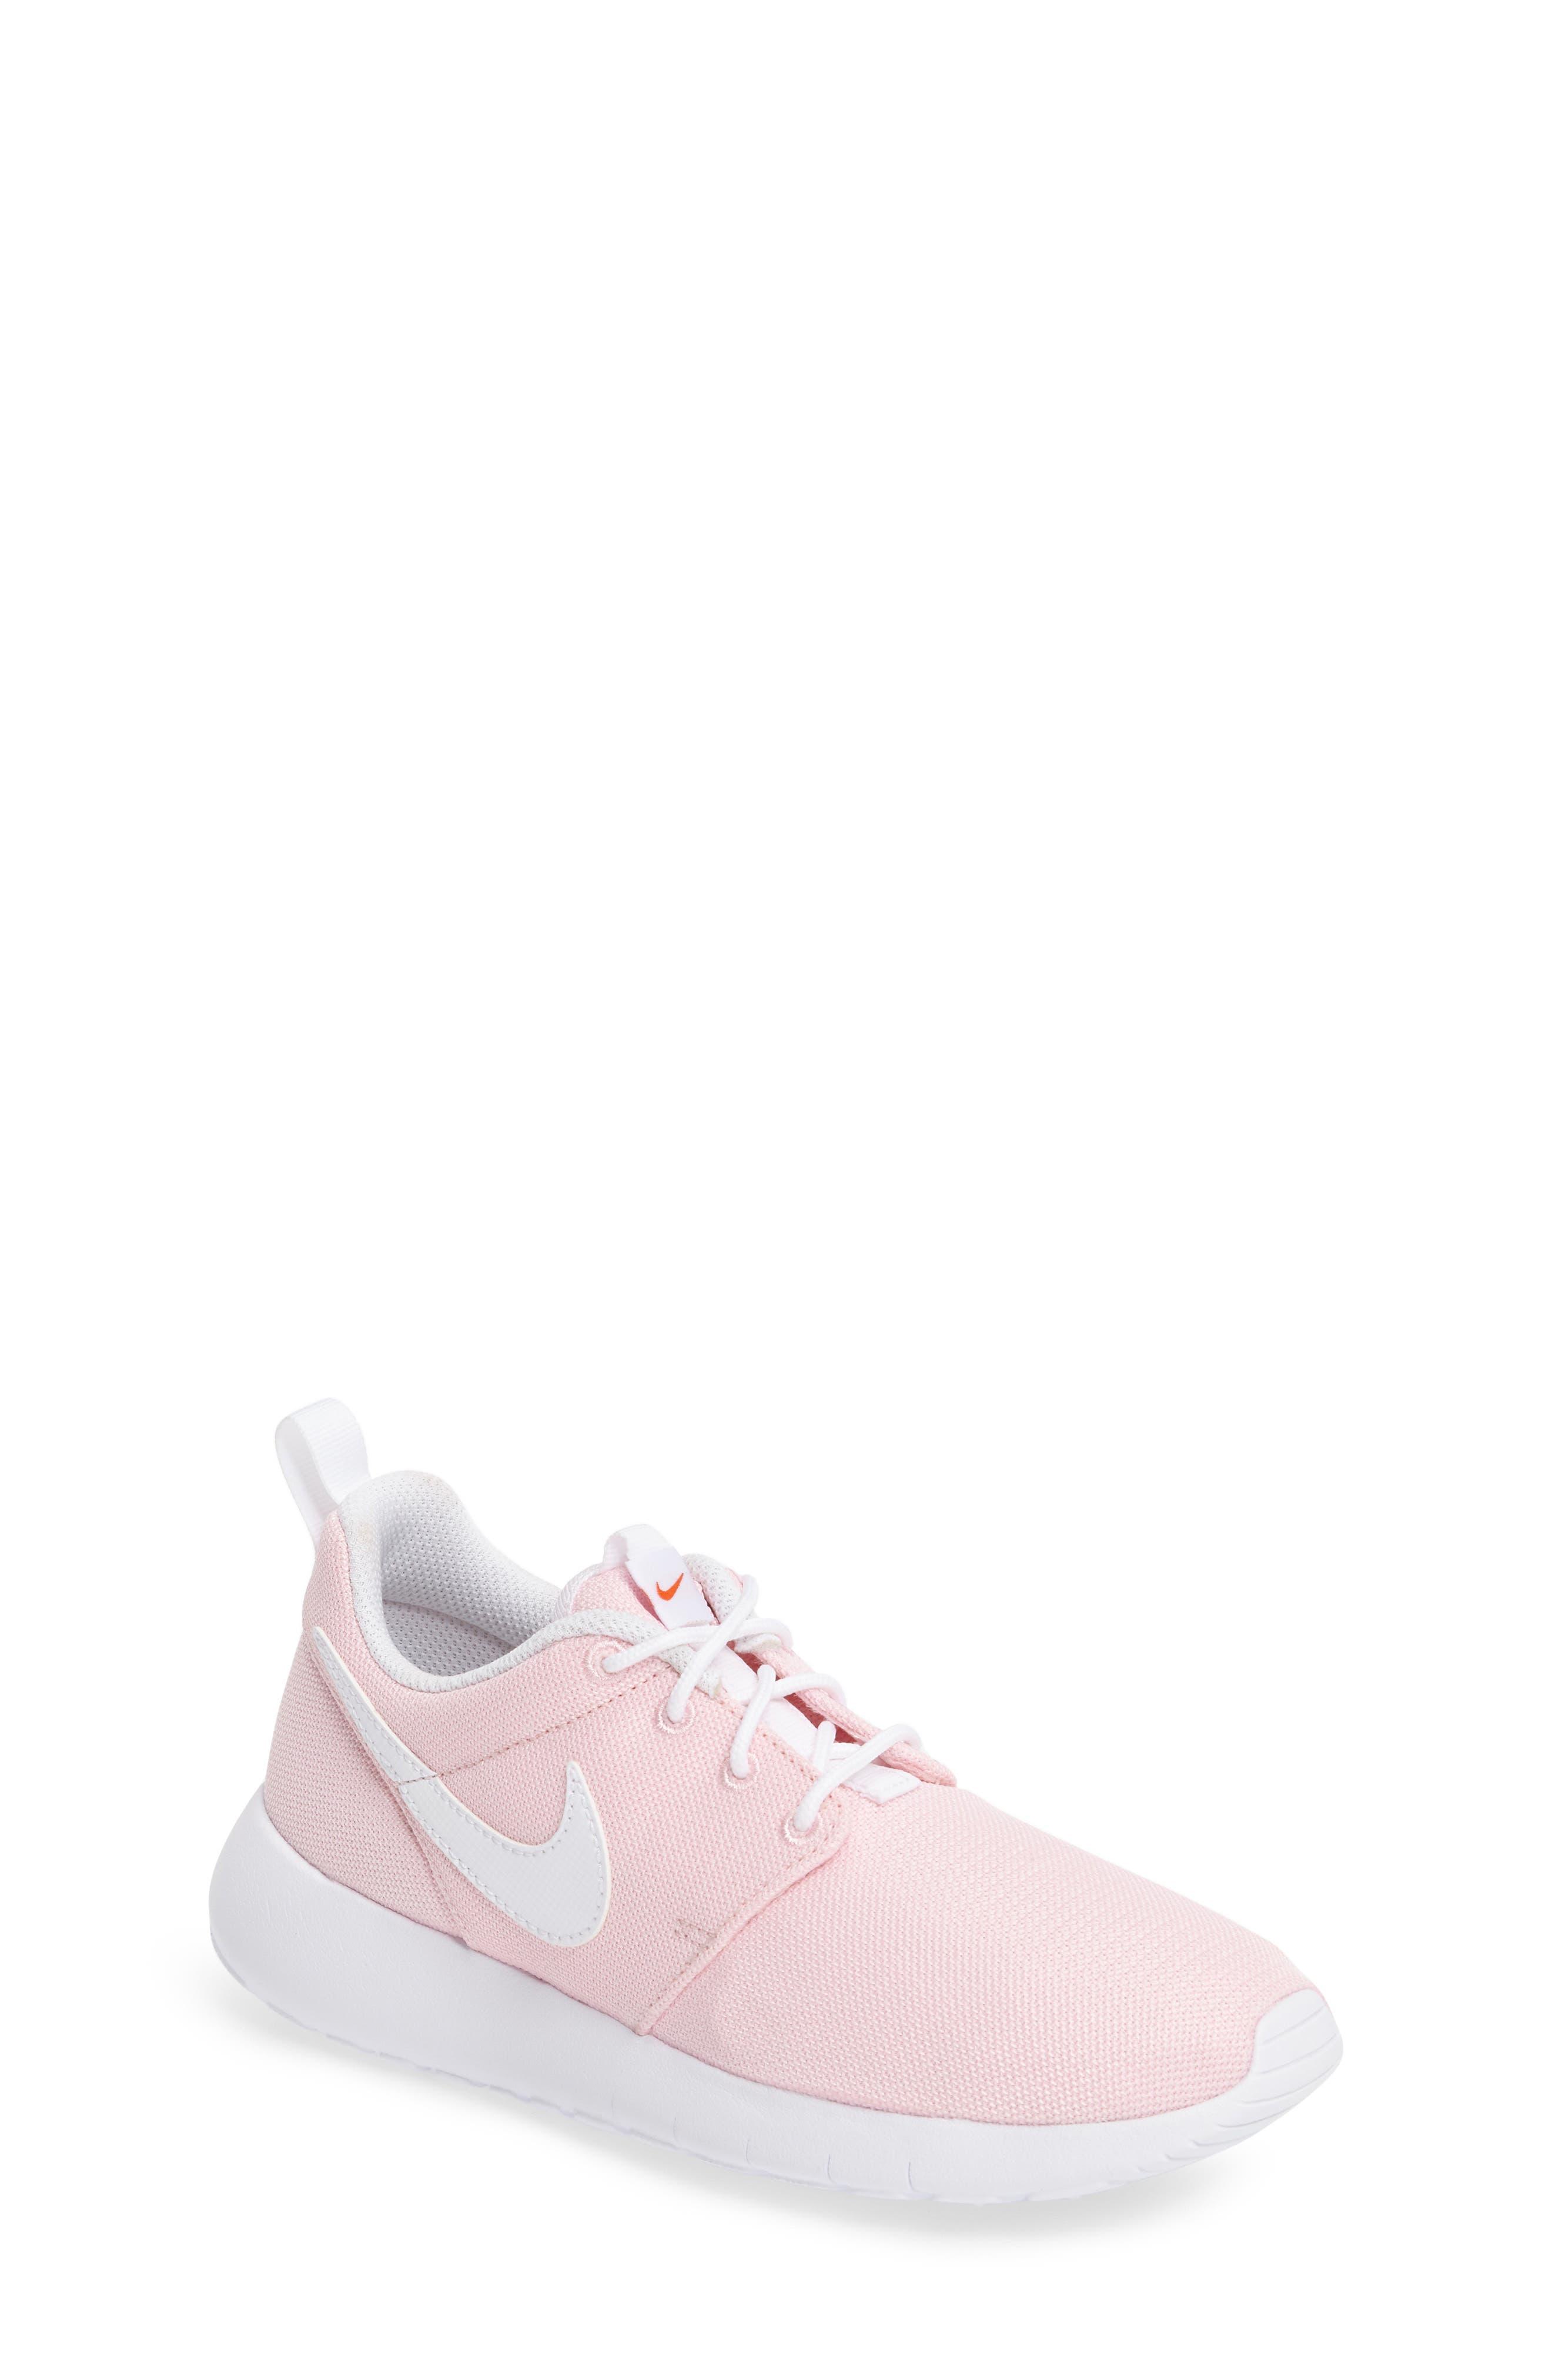 'Roshe Run' Athletic Shoe,                             Main thumbnail 48, color,